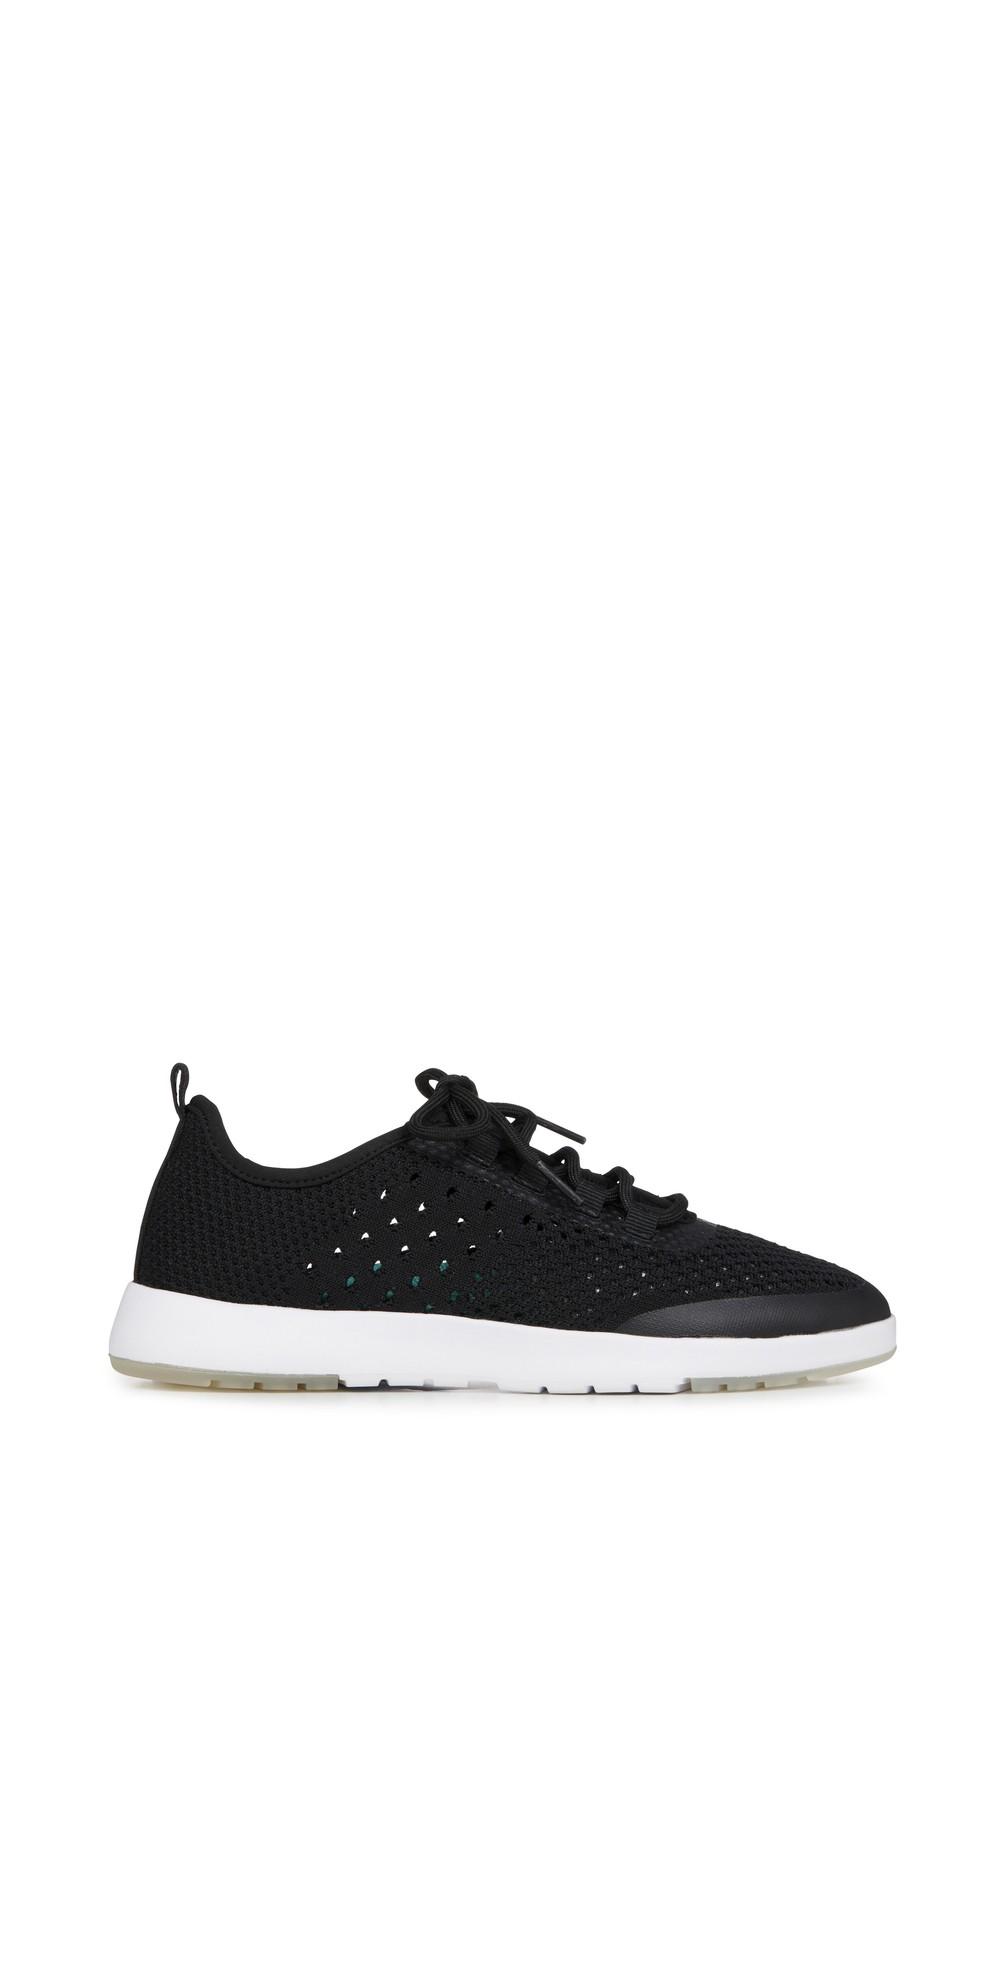 Miki Black Washable Sneakers main image